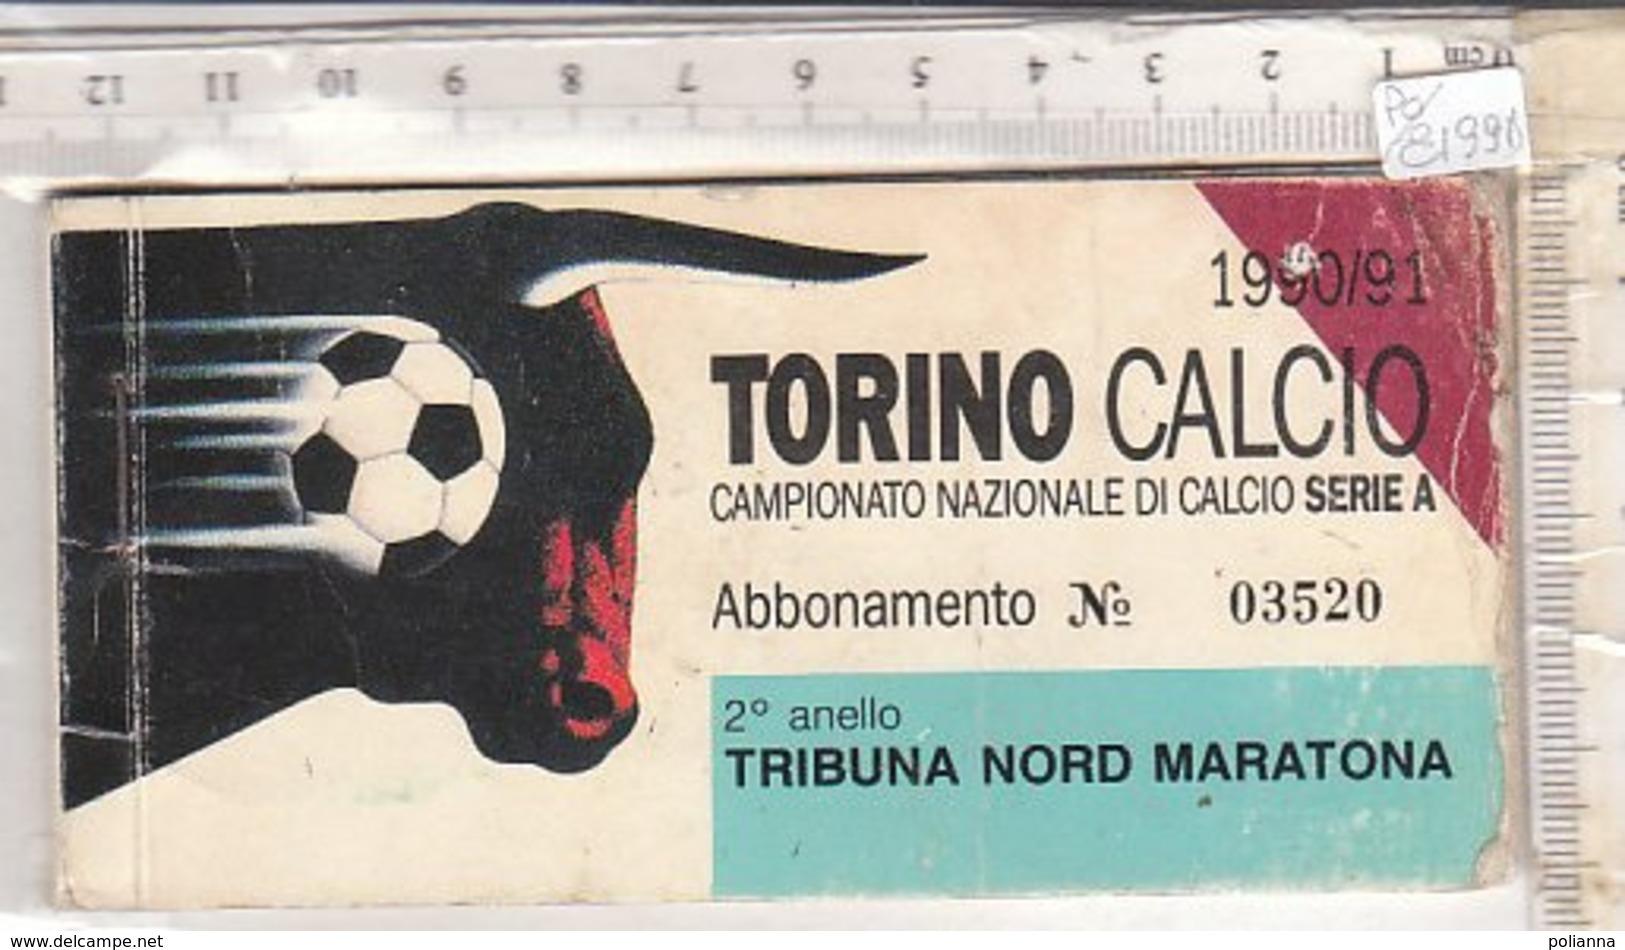 PO8199D# ABBONAMENTO INGRESSI STADIO CALCIO - TRIBUNA NORD MARATONA - TORINO 1990/91 - Calcio